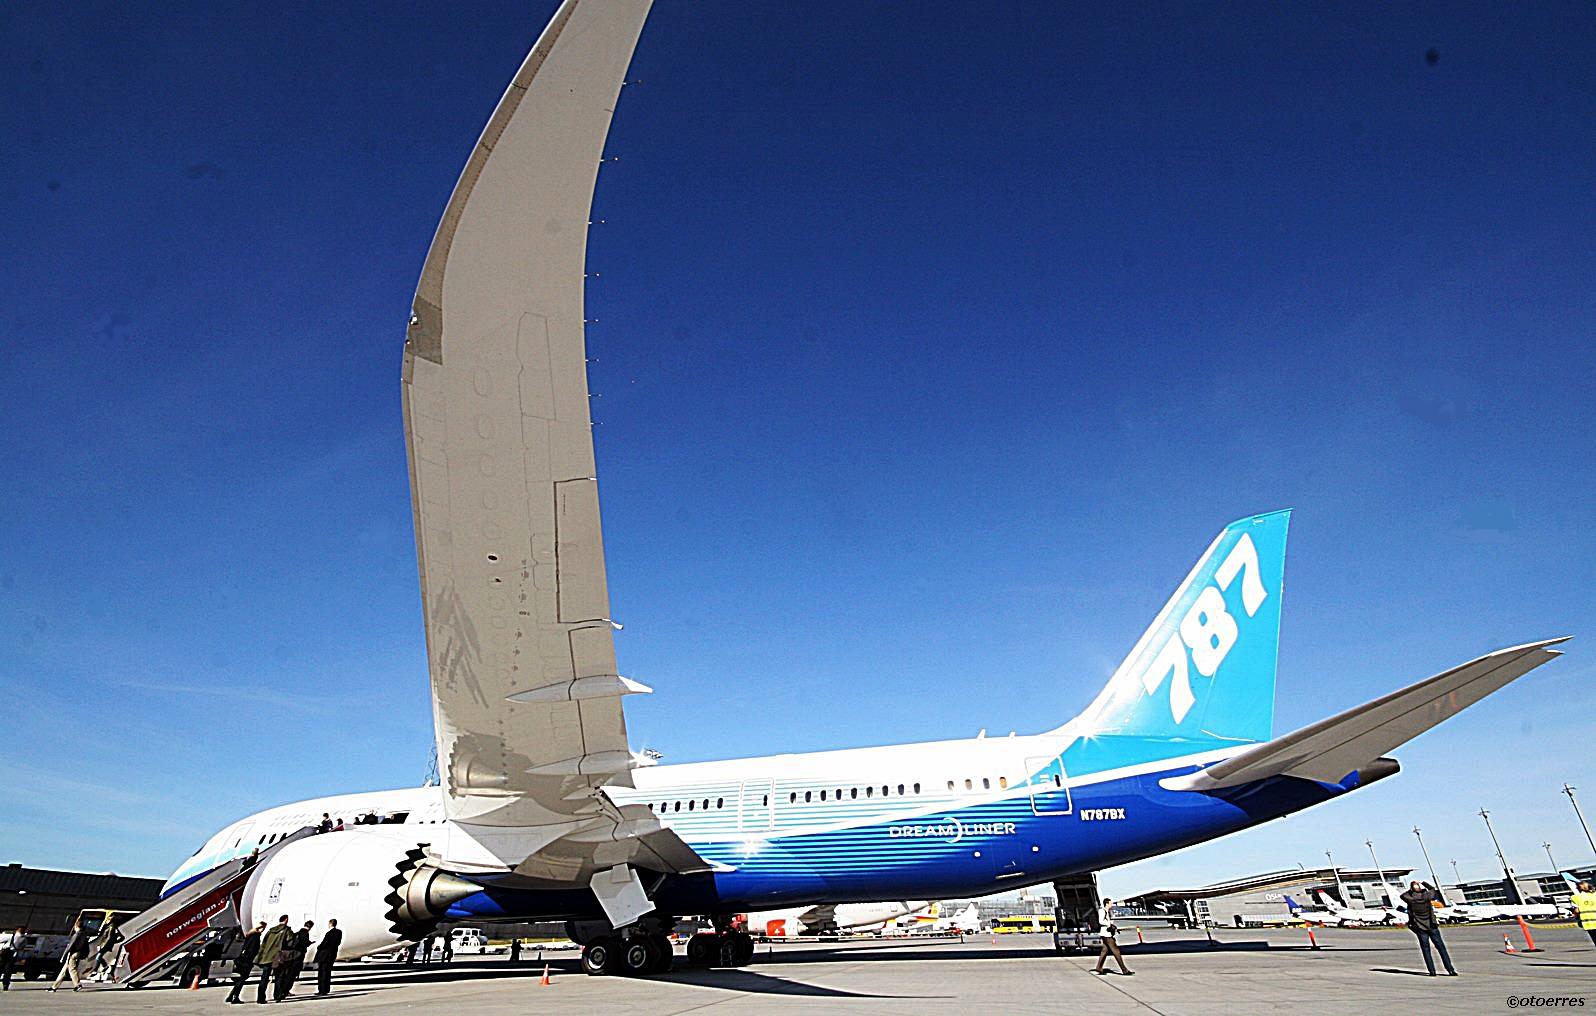 Boeing B 787 Dreamliner - Oslo Airport -Gardermoen 2012